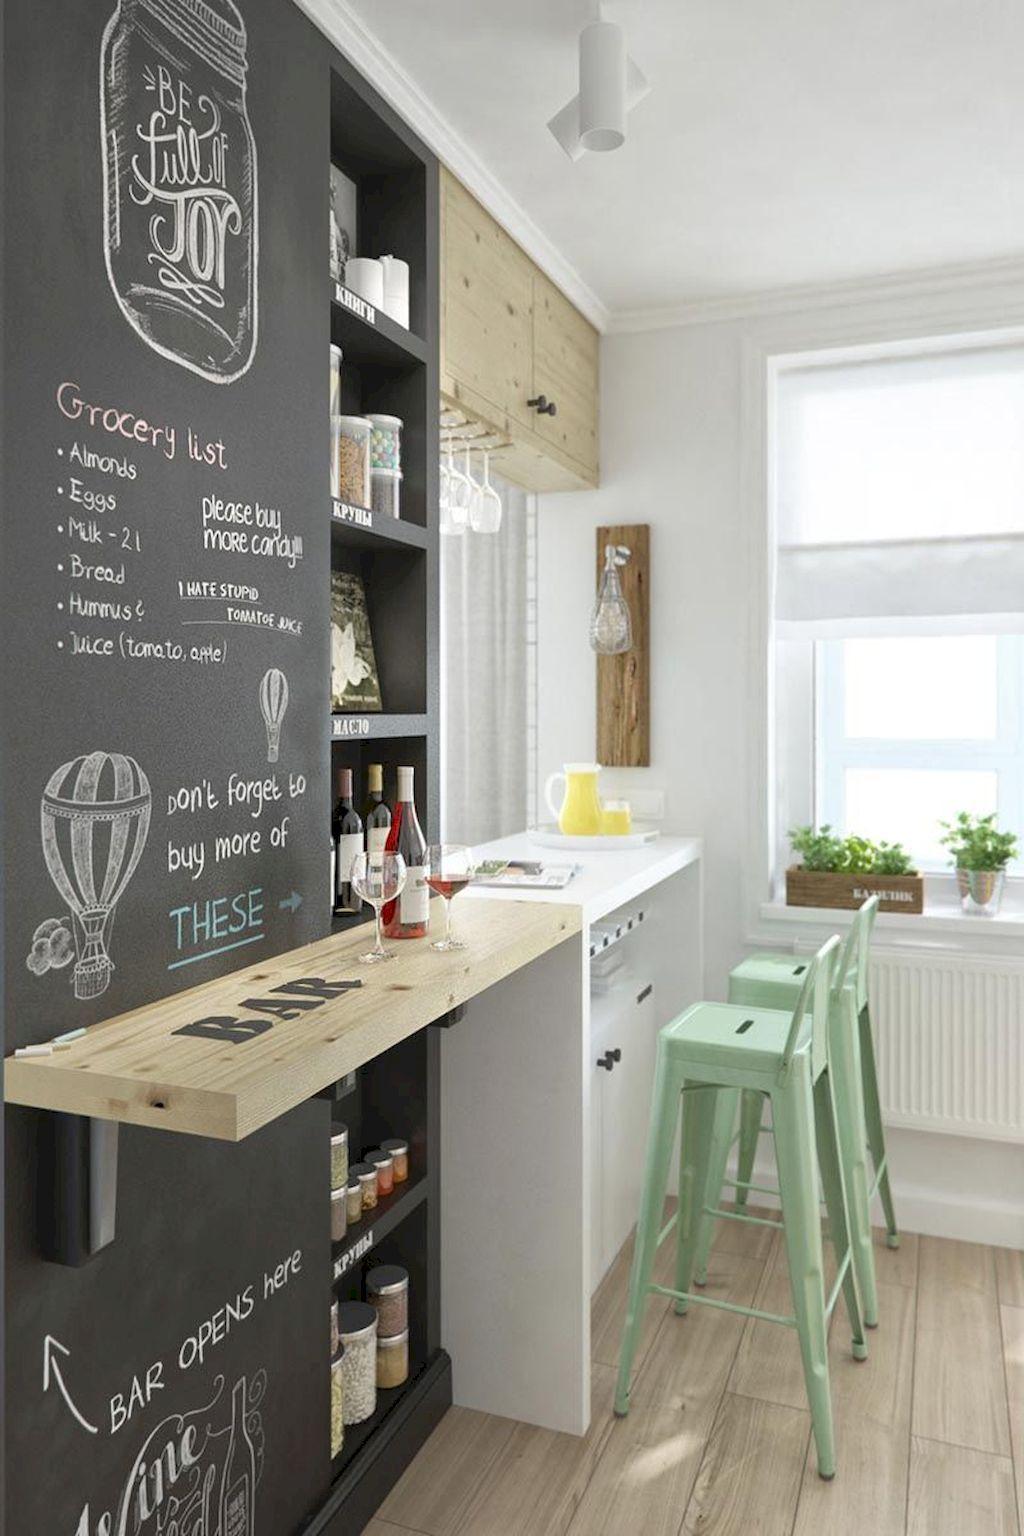 Barra bar bar kitchen table in small kitchen kitchen ideas kitchen dining